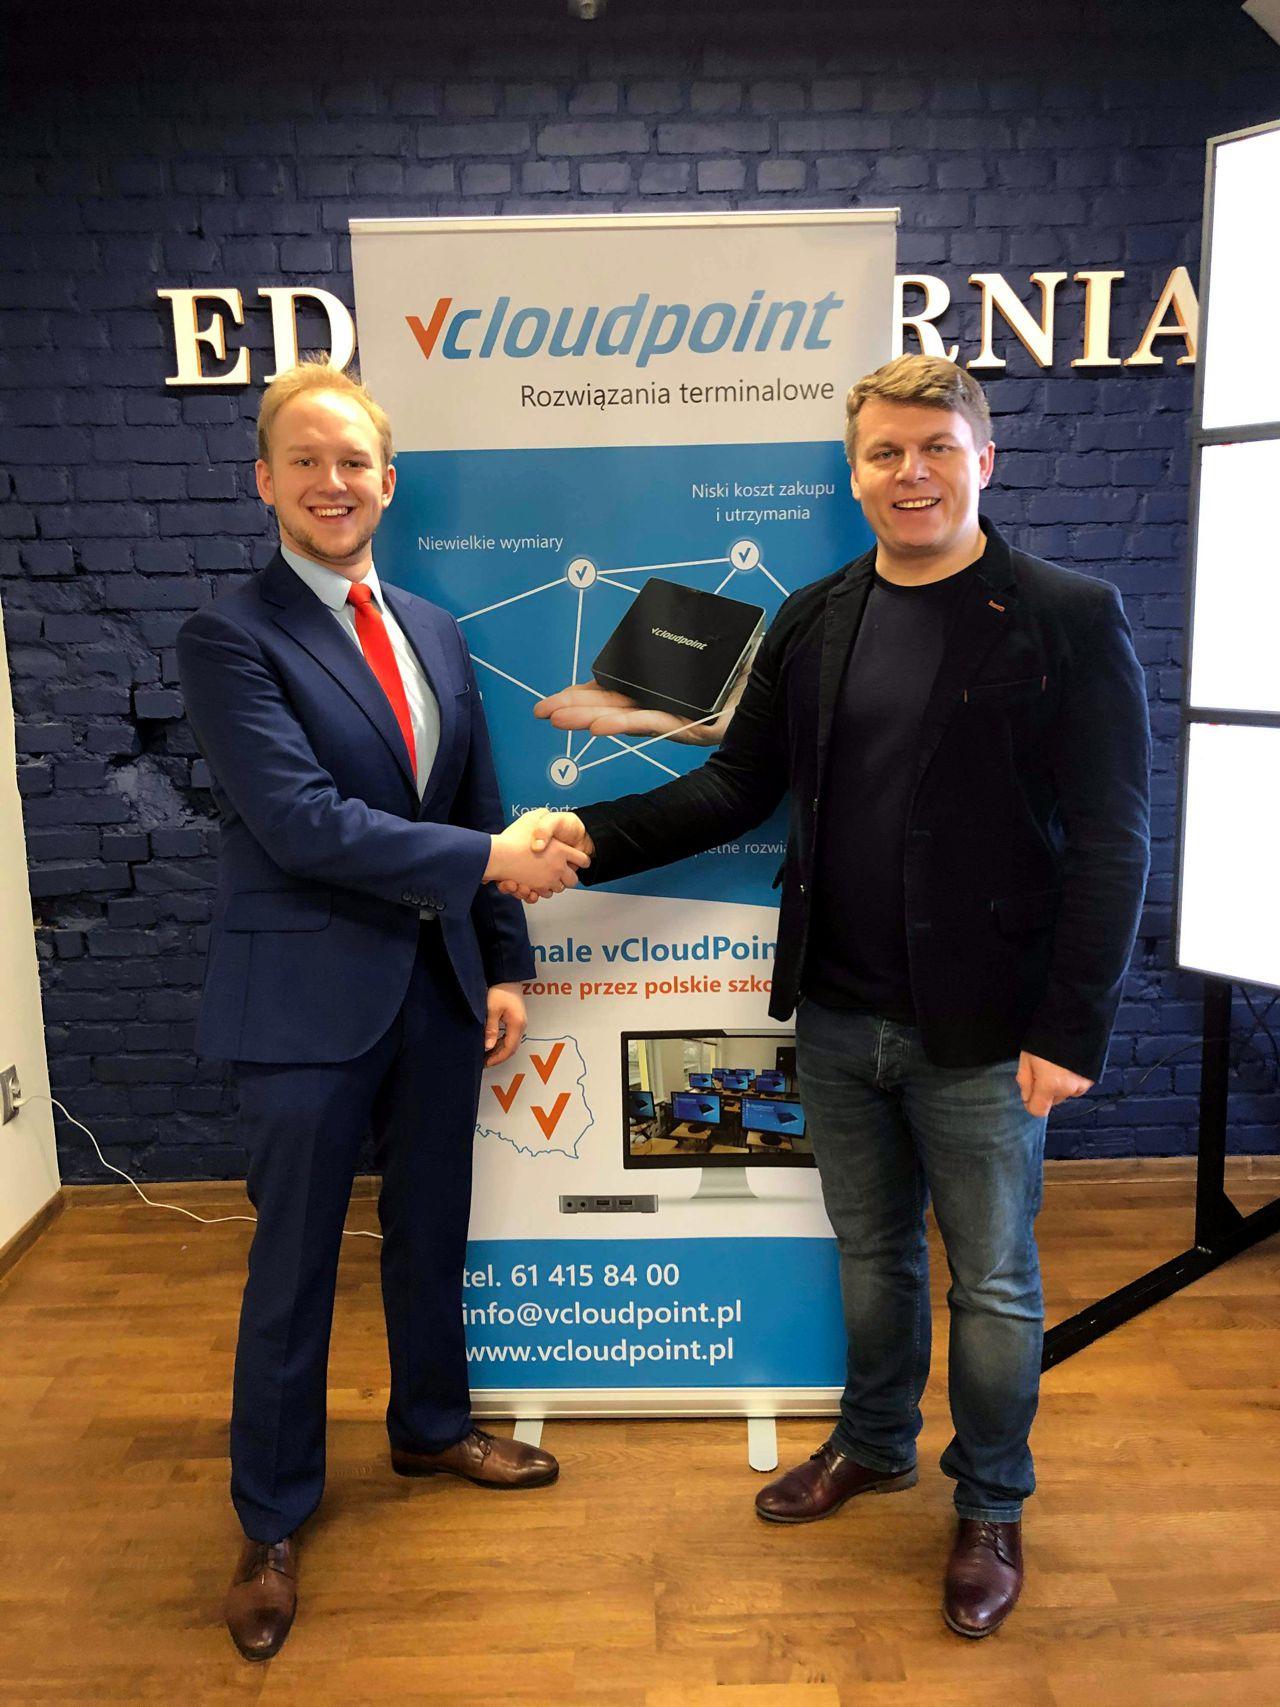 EDUKATORNIA Gdańsk - pracownia terminalowa vCloudPoint